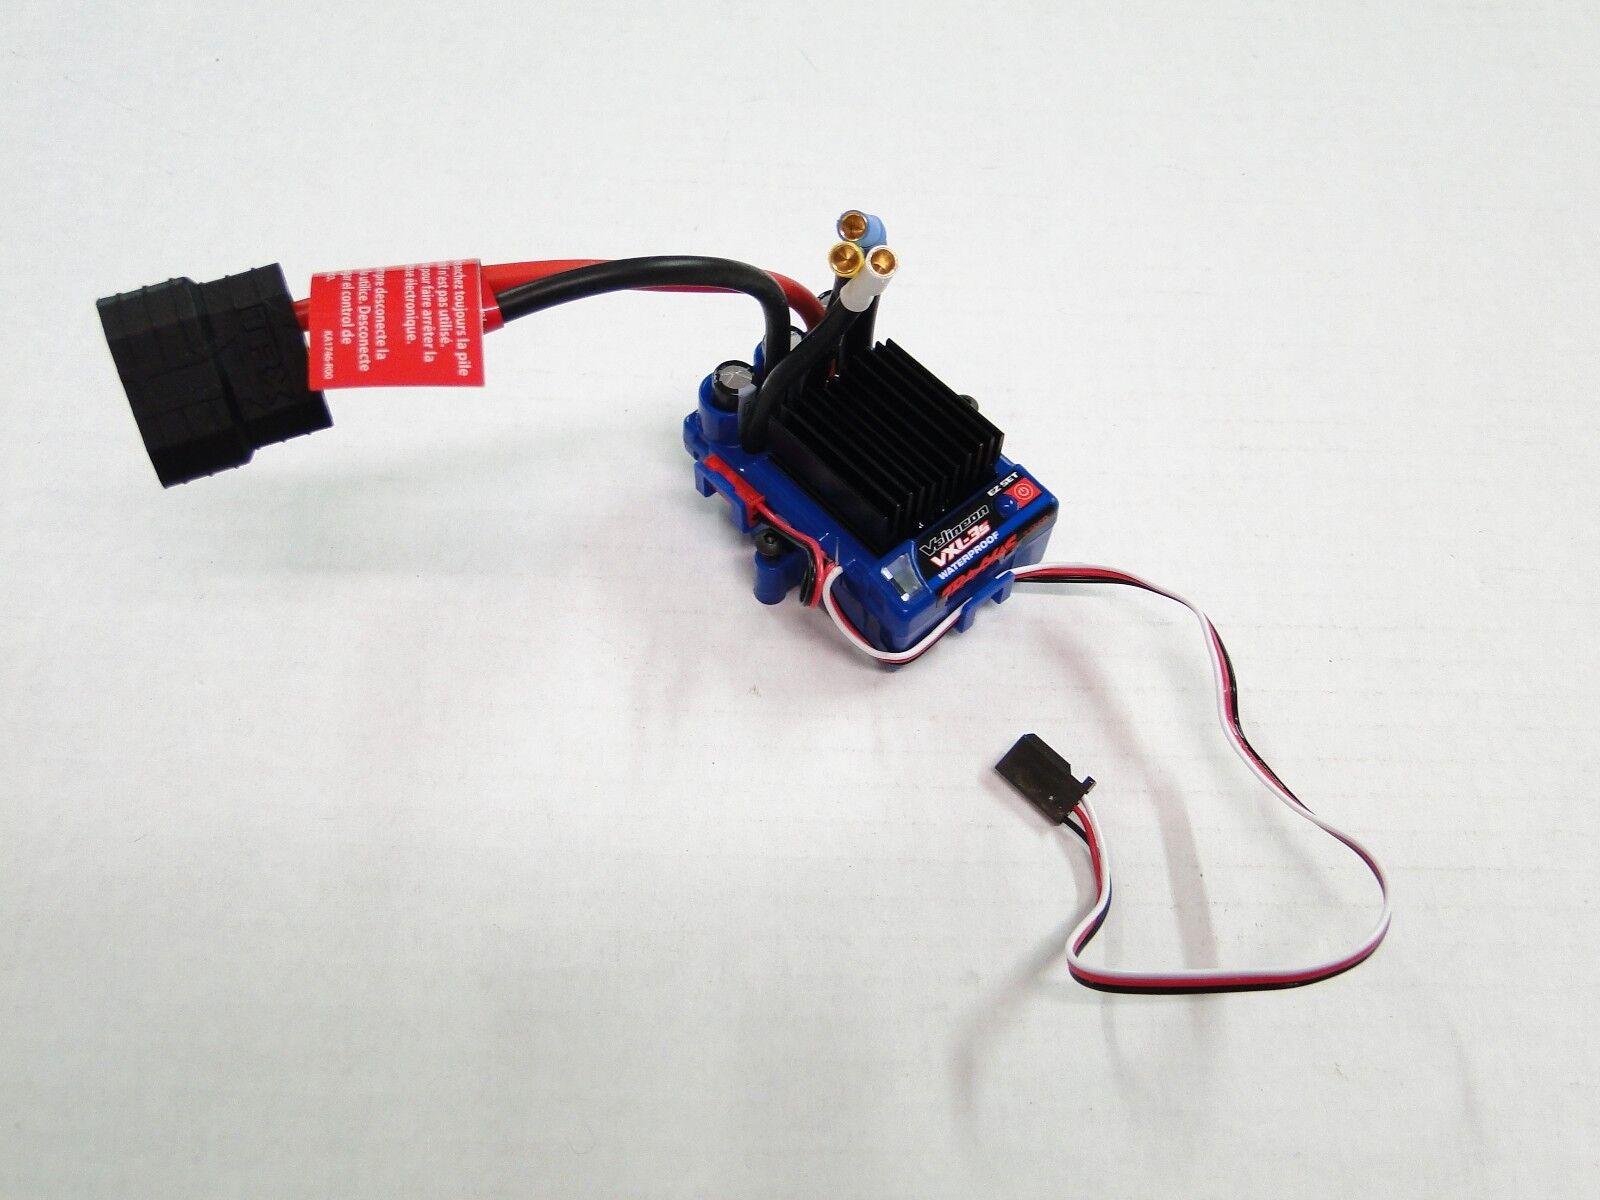 Nuovo TRAXXAS SLASH 1 10 4X4 4X4 4X4 ULTIMATE ESC VXL-3s ID CONNECTOR 3355R PLATINUM RFE 2ddd8b